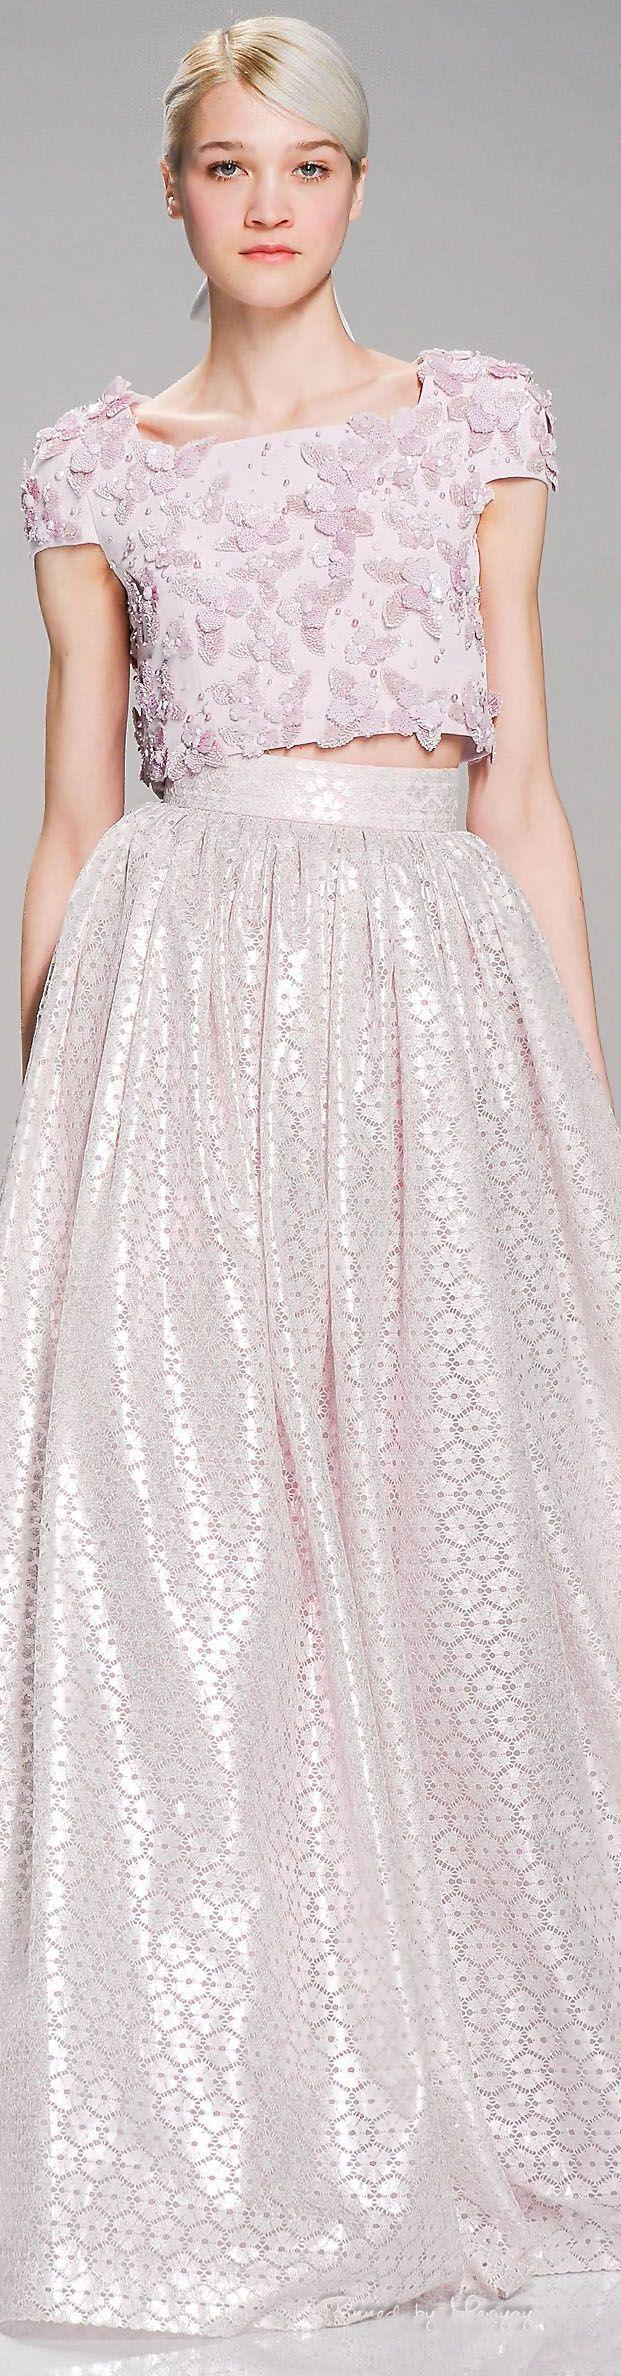 195 best Dresses images on Pinterest | Marchesa spring, Cute dresses ...